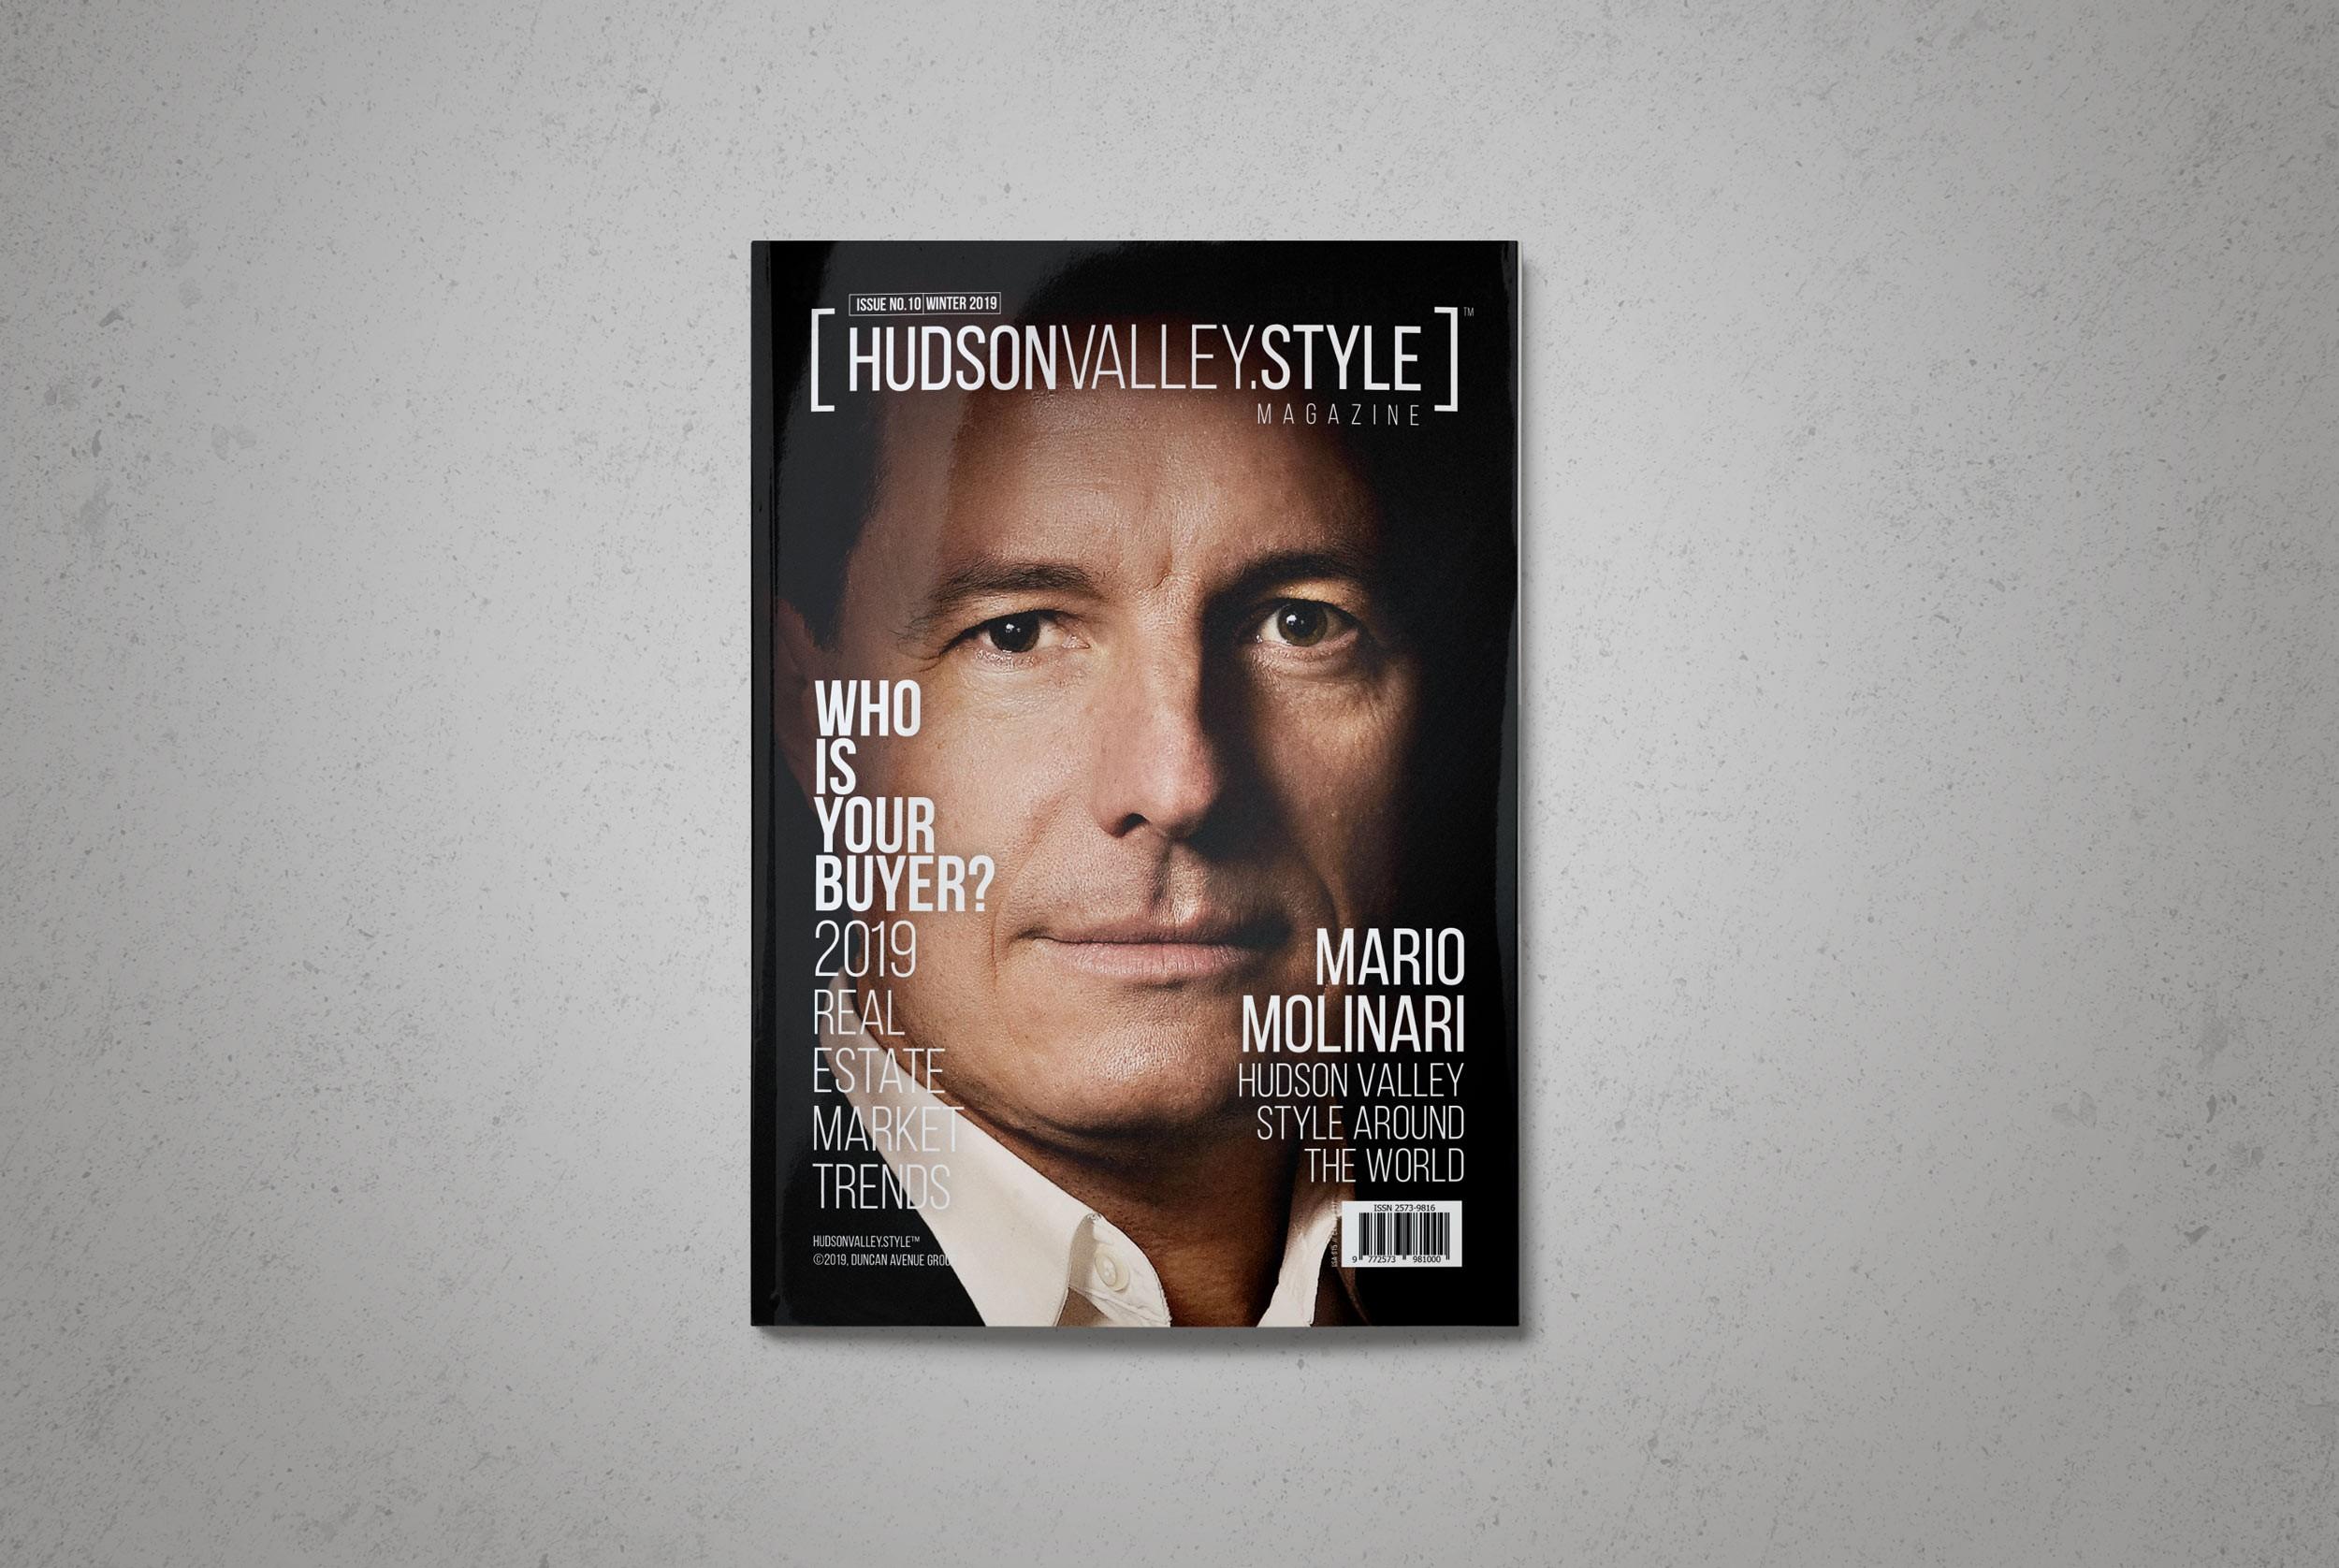 Hudson Valley Style Magazine - Winter 2019 - Mario Molinari